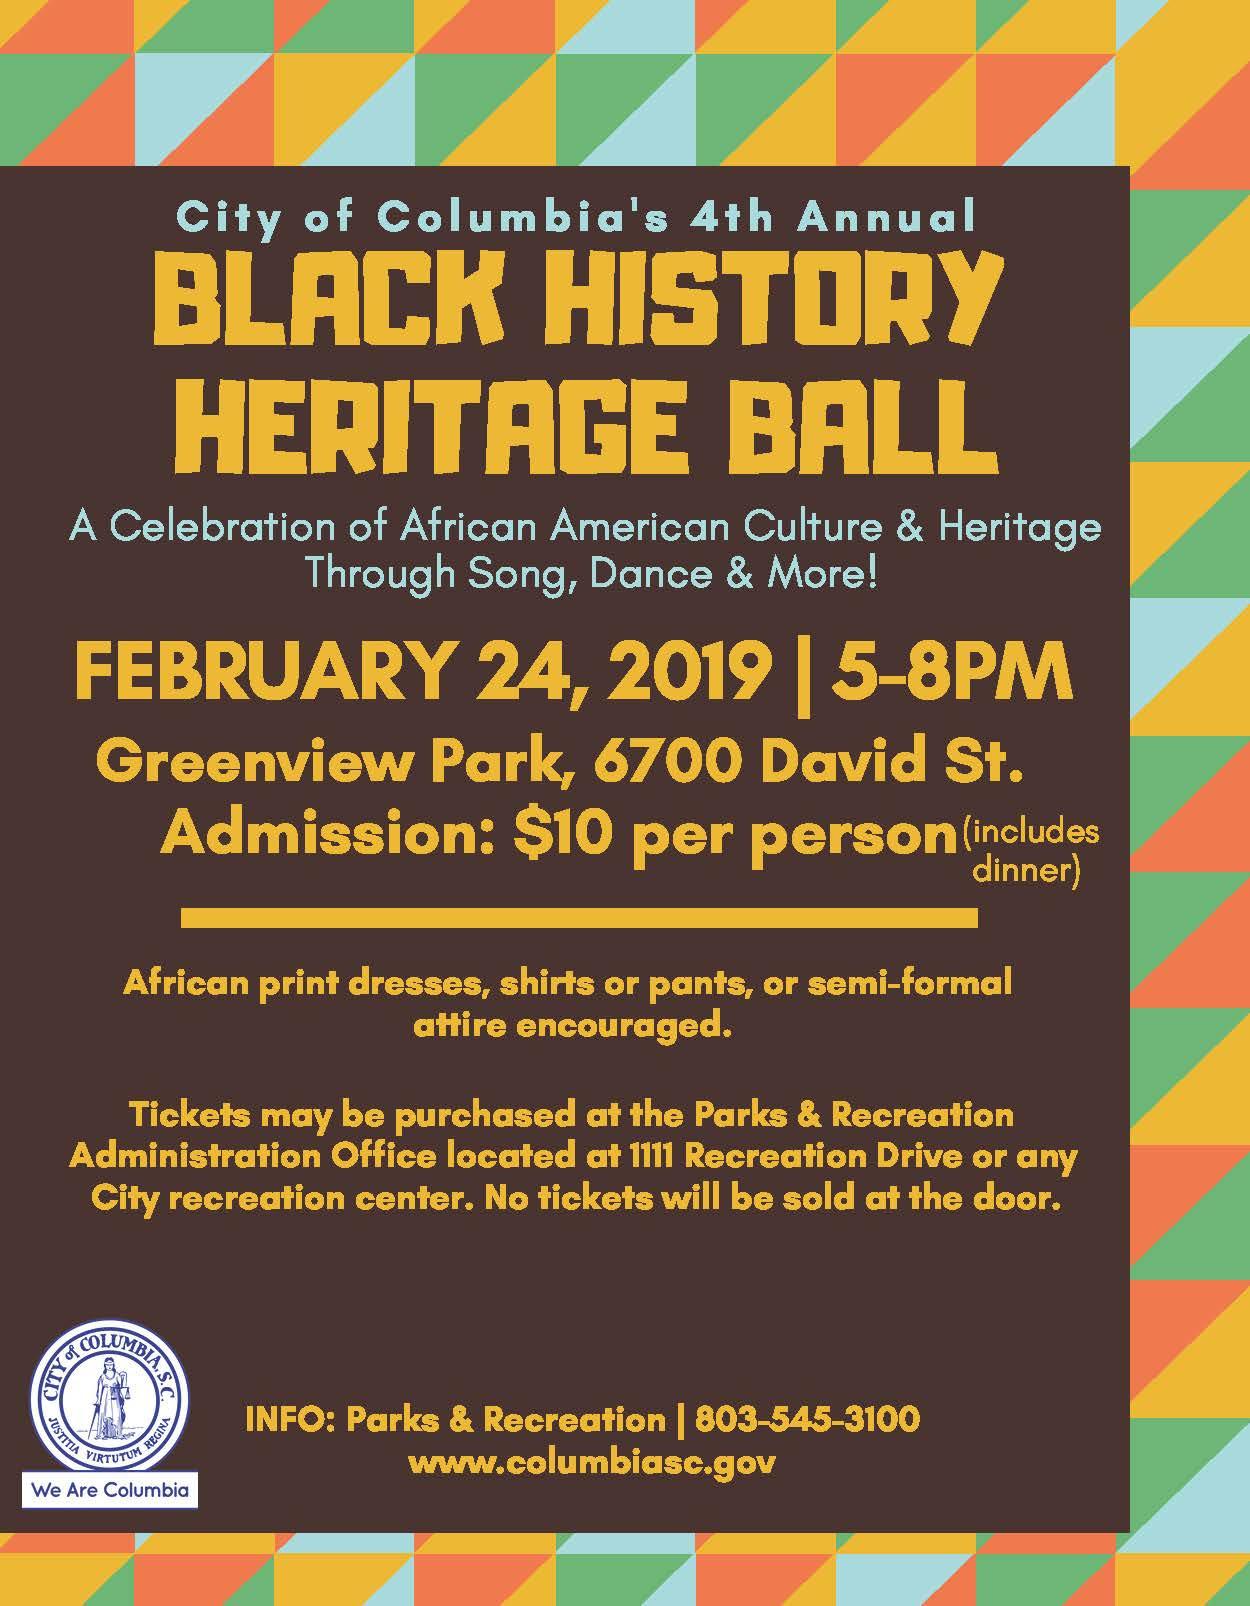 Black History Heritage Ball | One Columbia